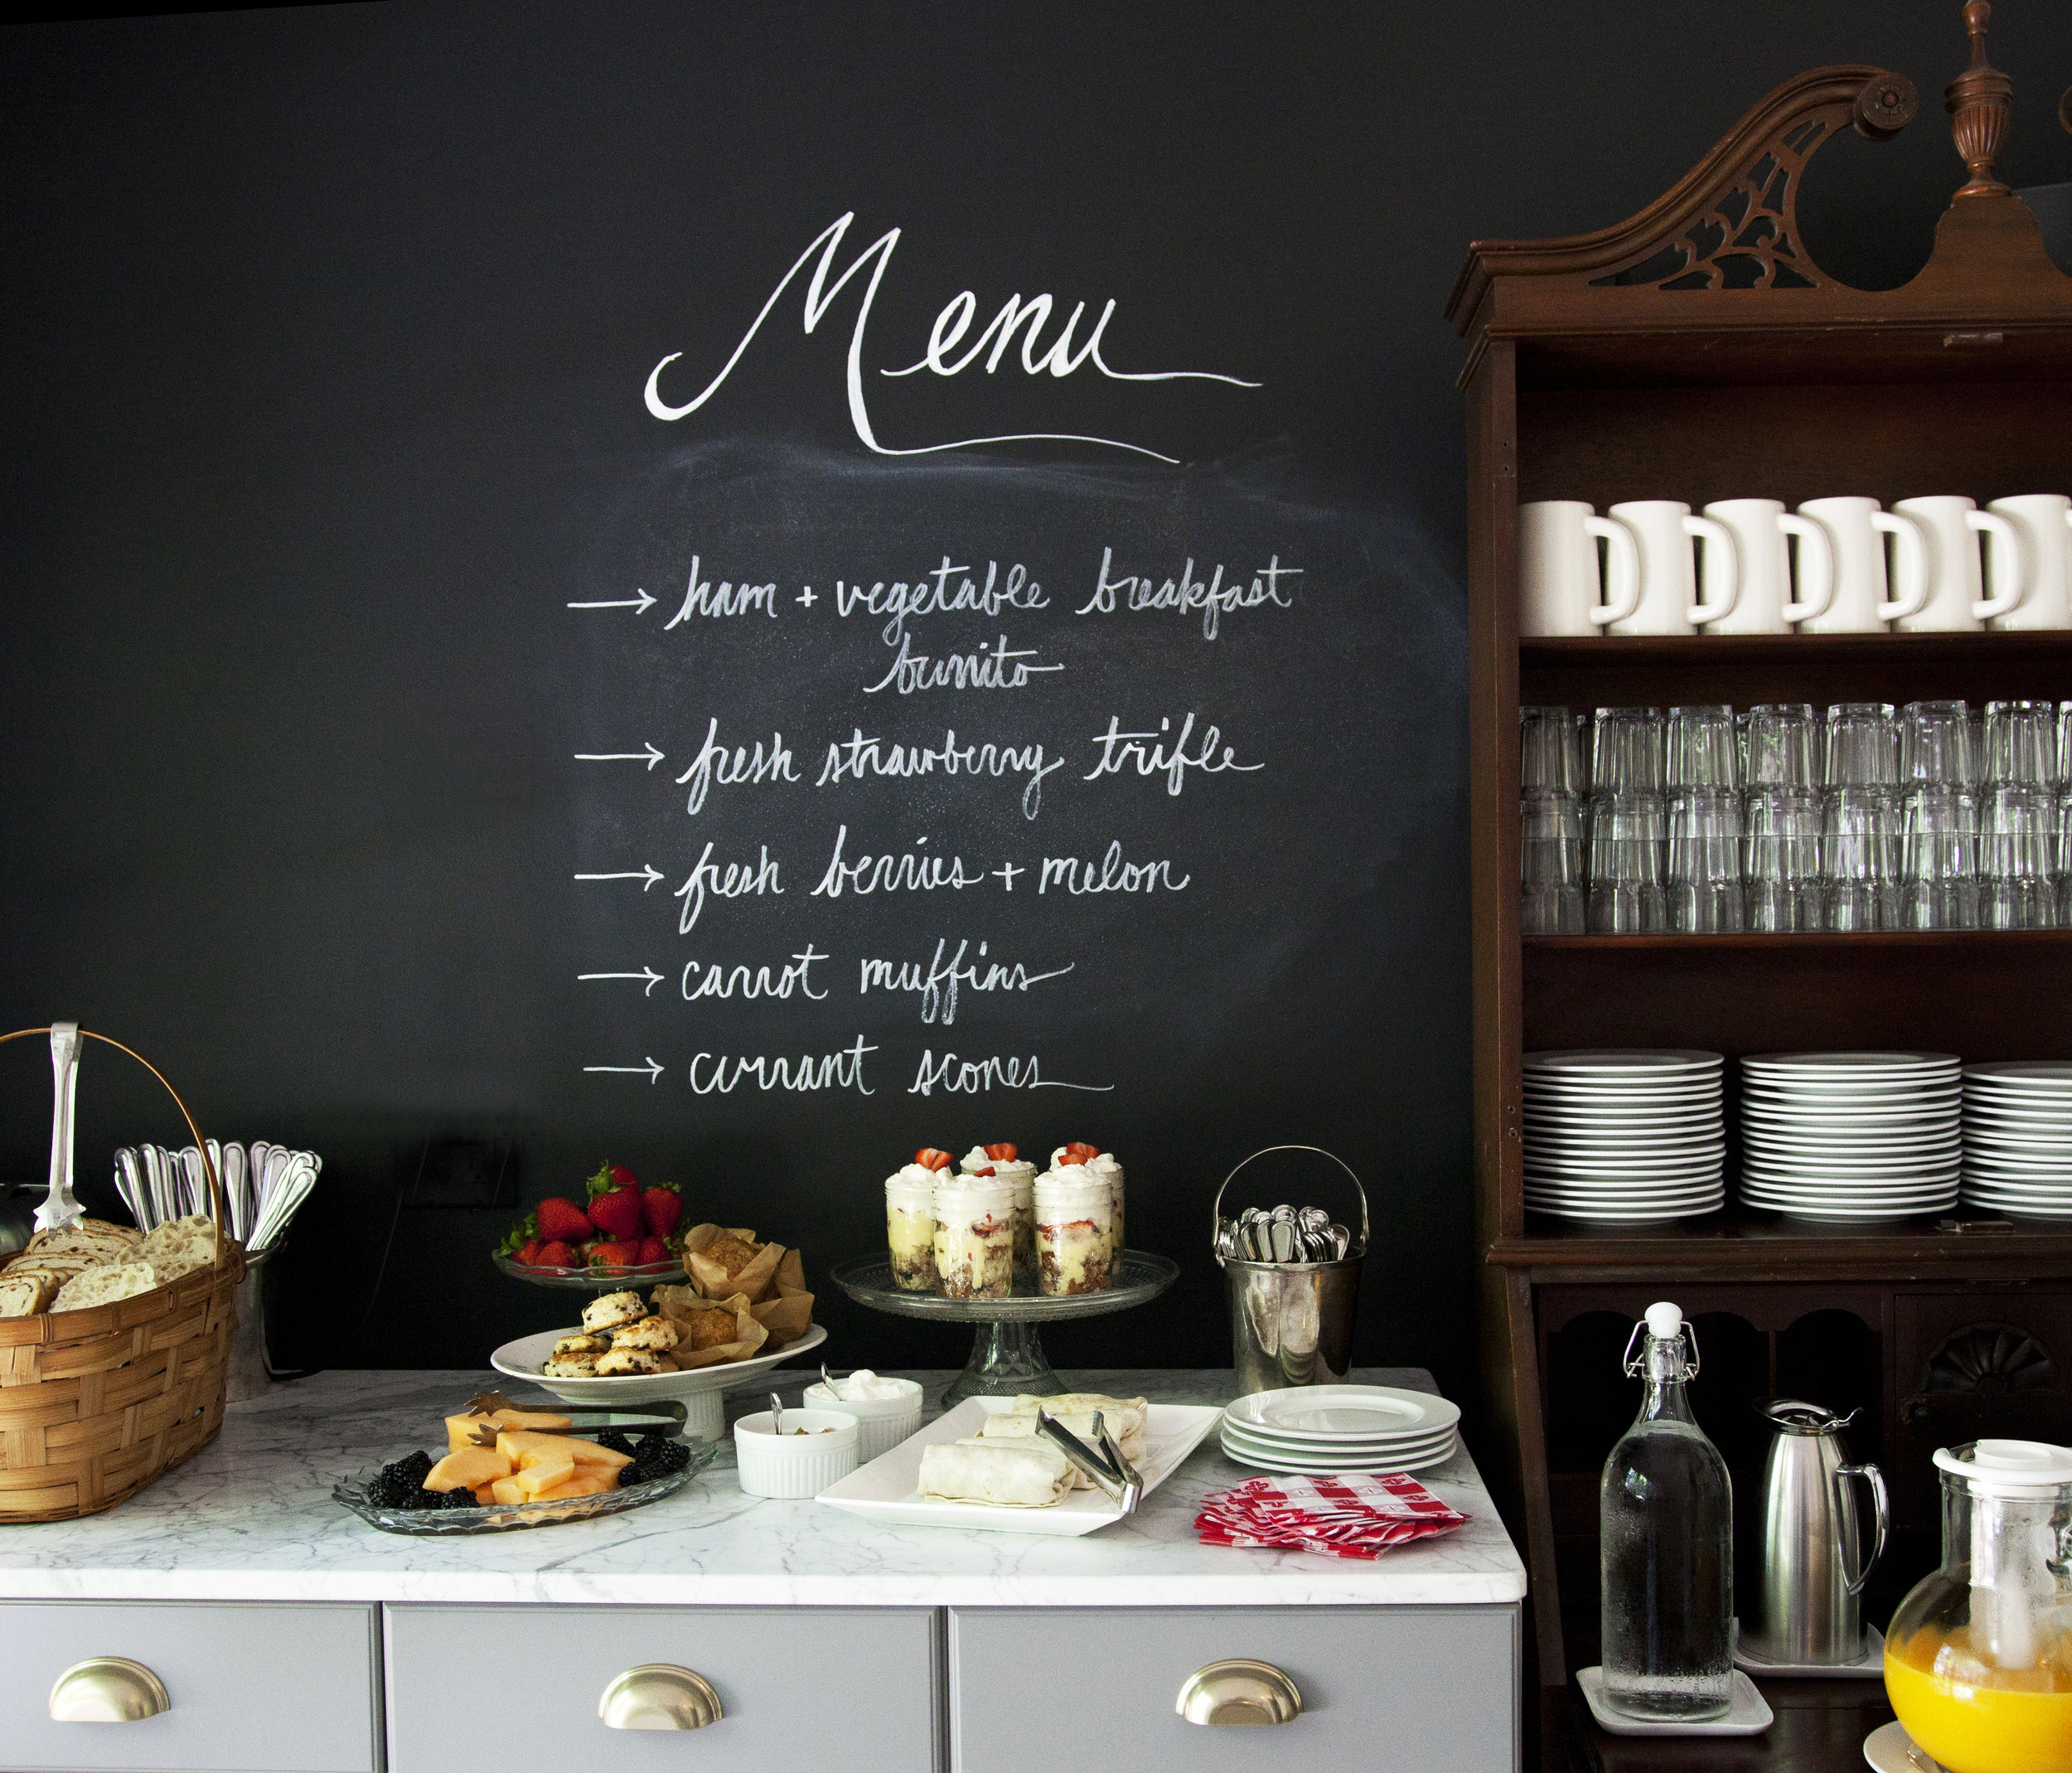 Breakfast Buffet Eban House Cape Cod.jpg